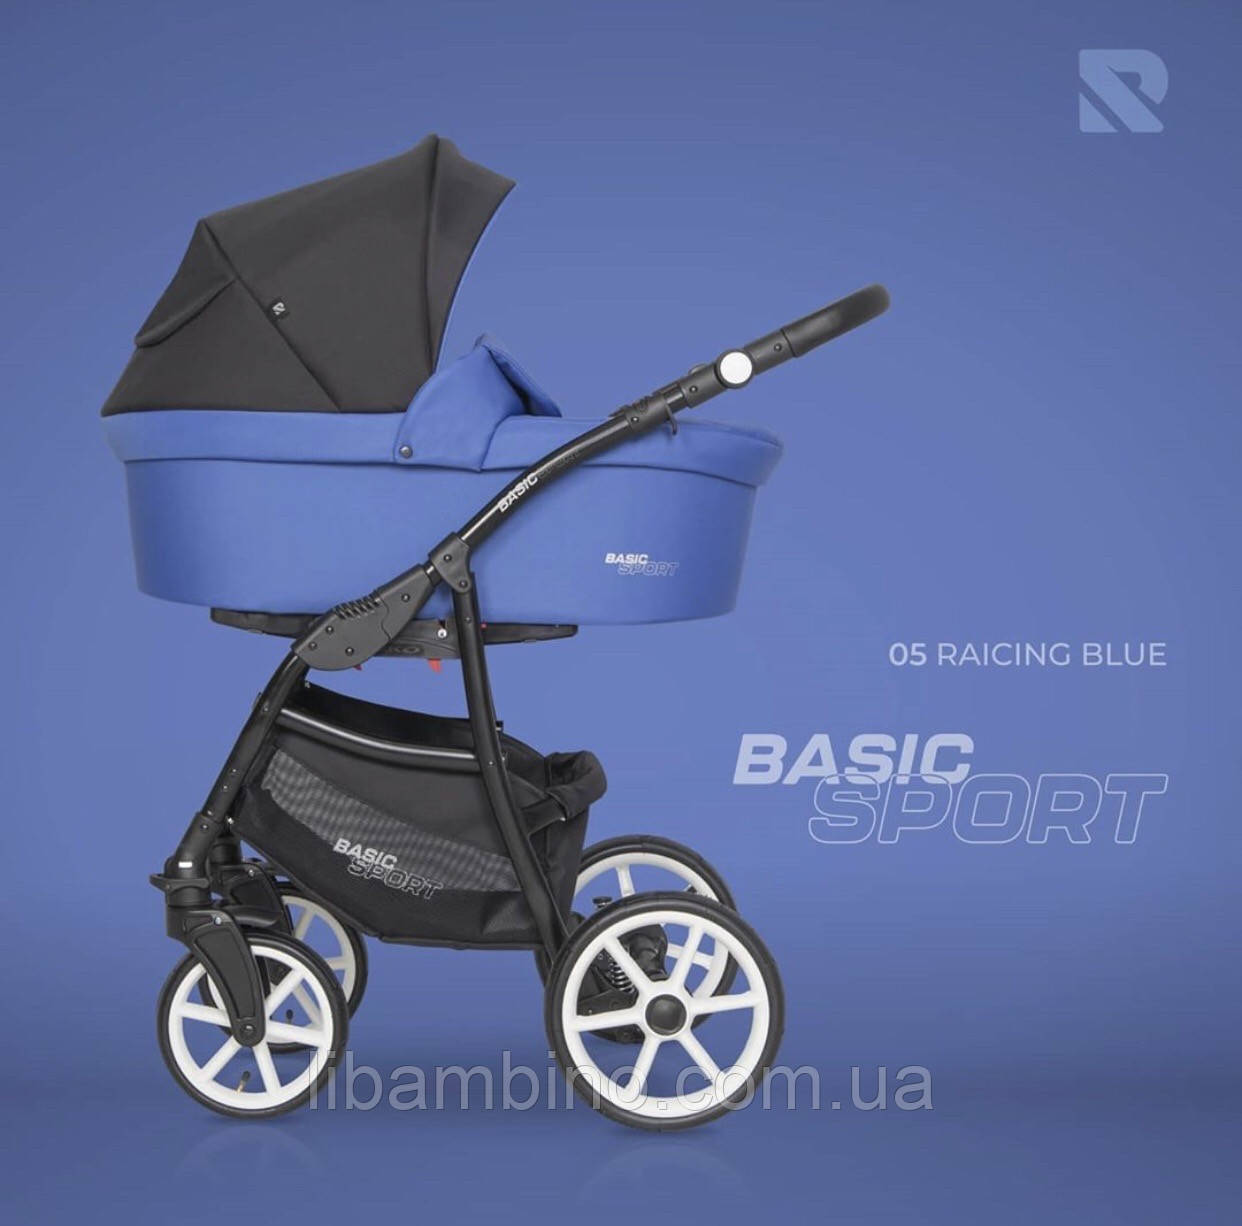 Дитяча універсальна коляска 2 в 1 Riko Basic Sport 05 Raicing Blue